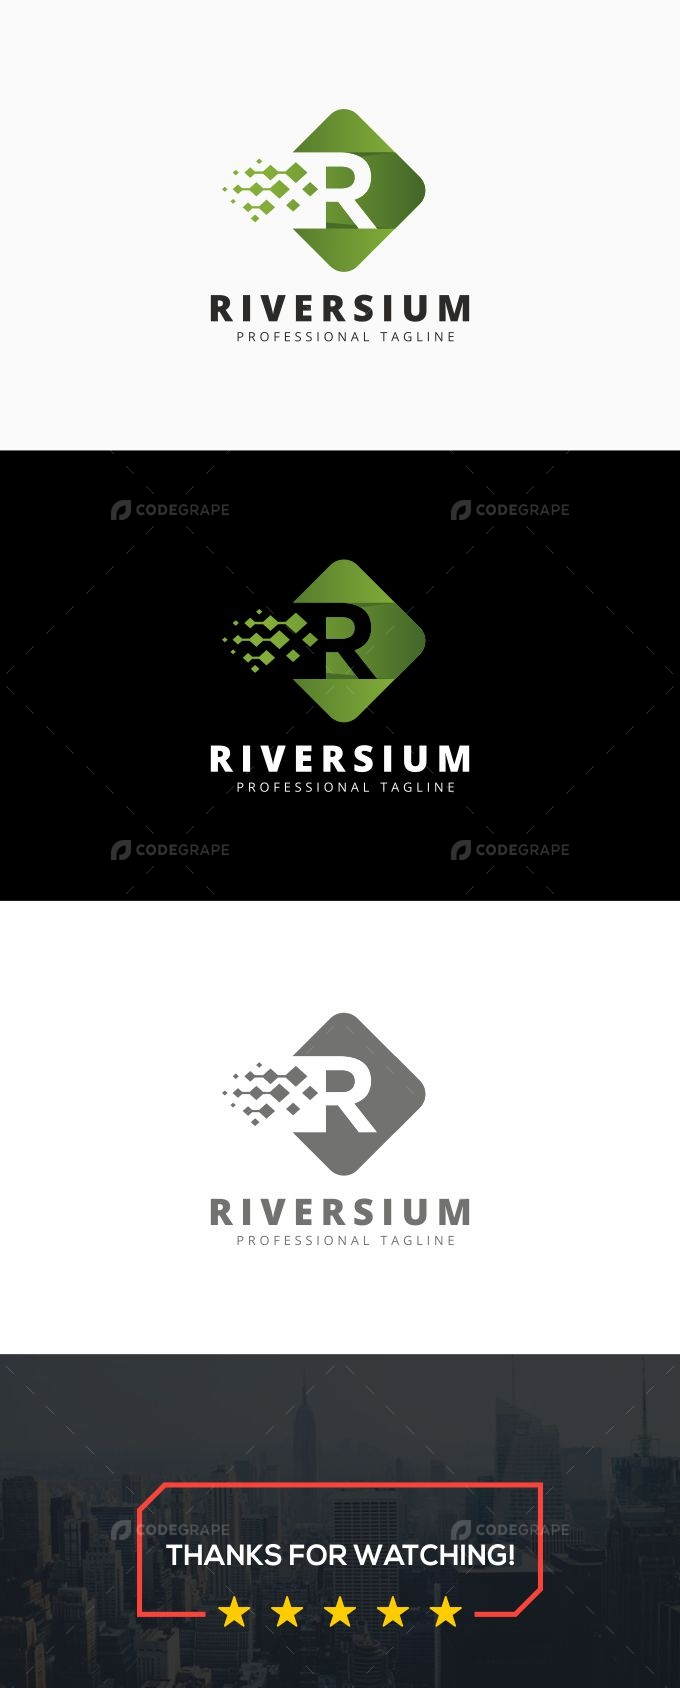 R Letter - Riversium Logo